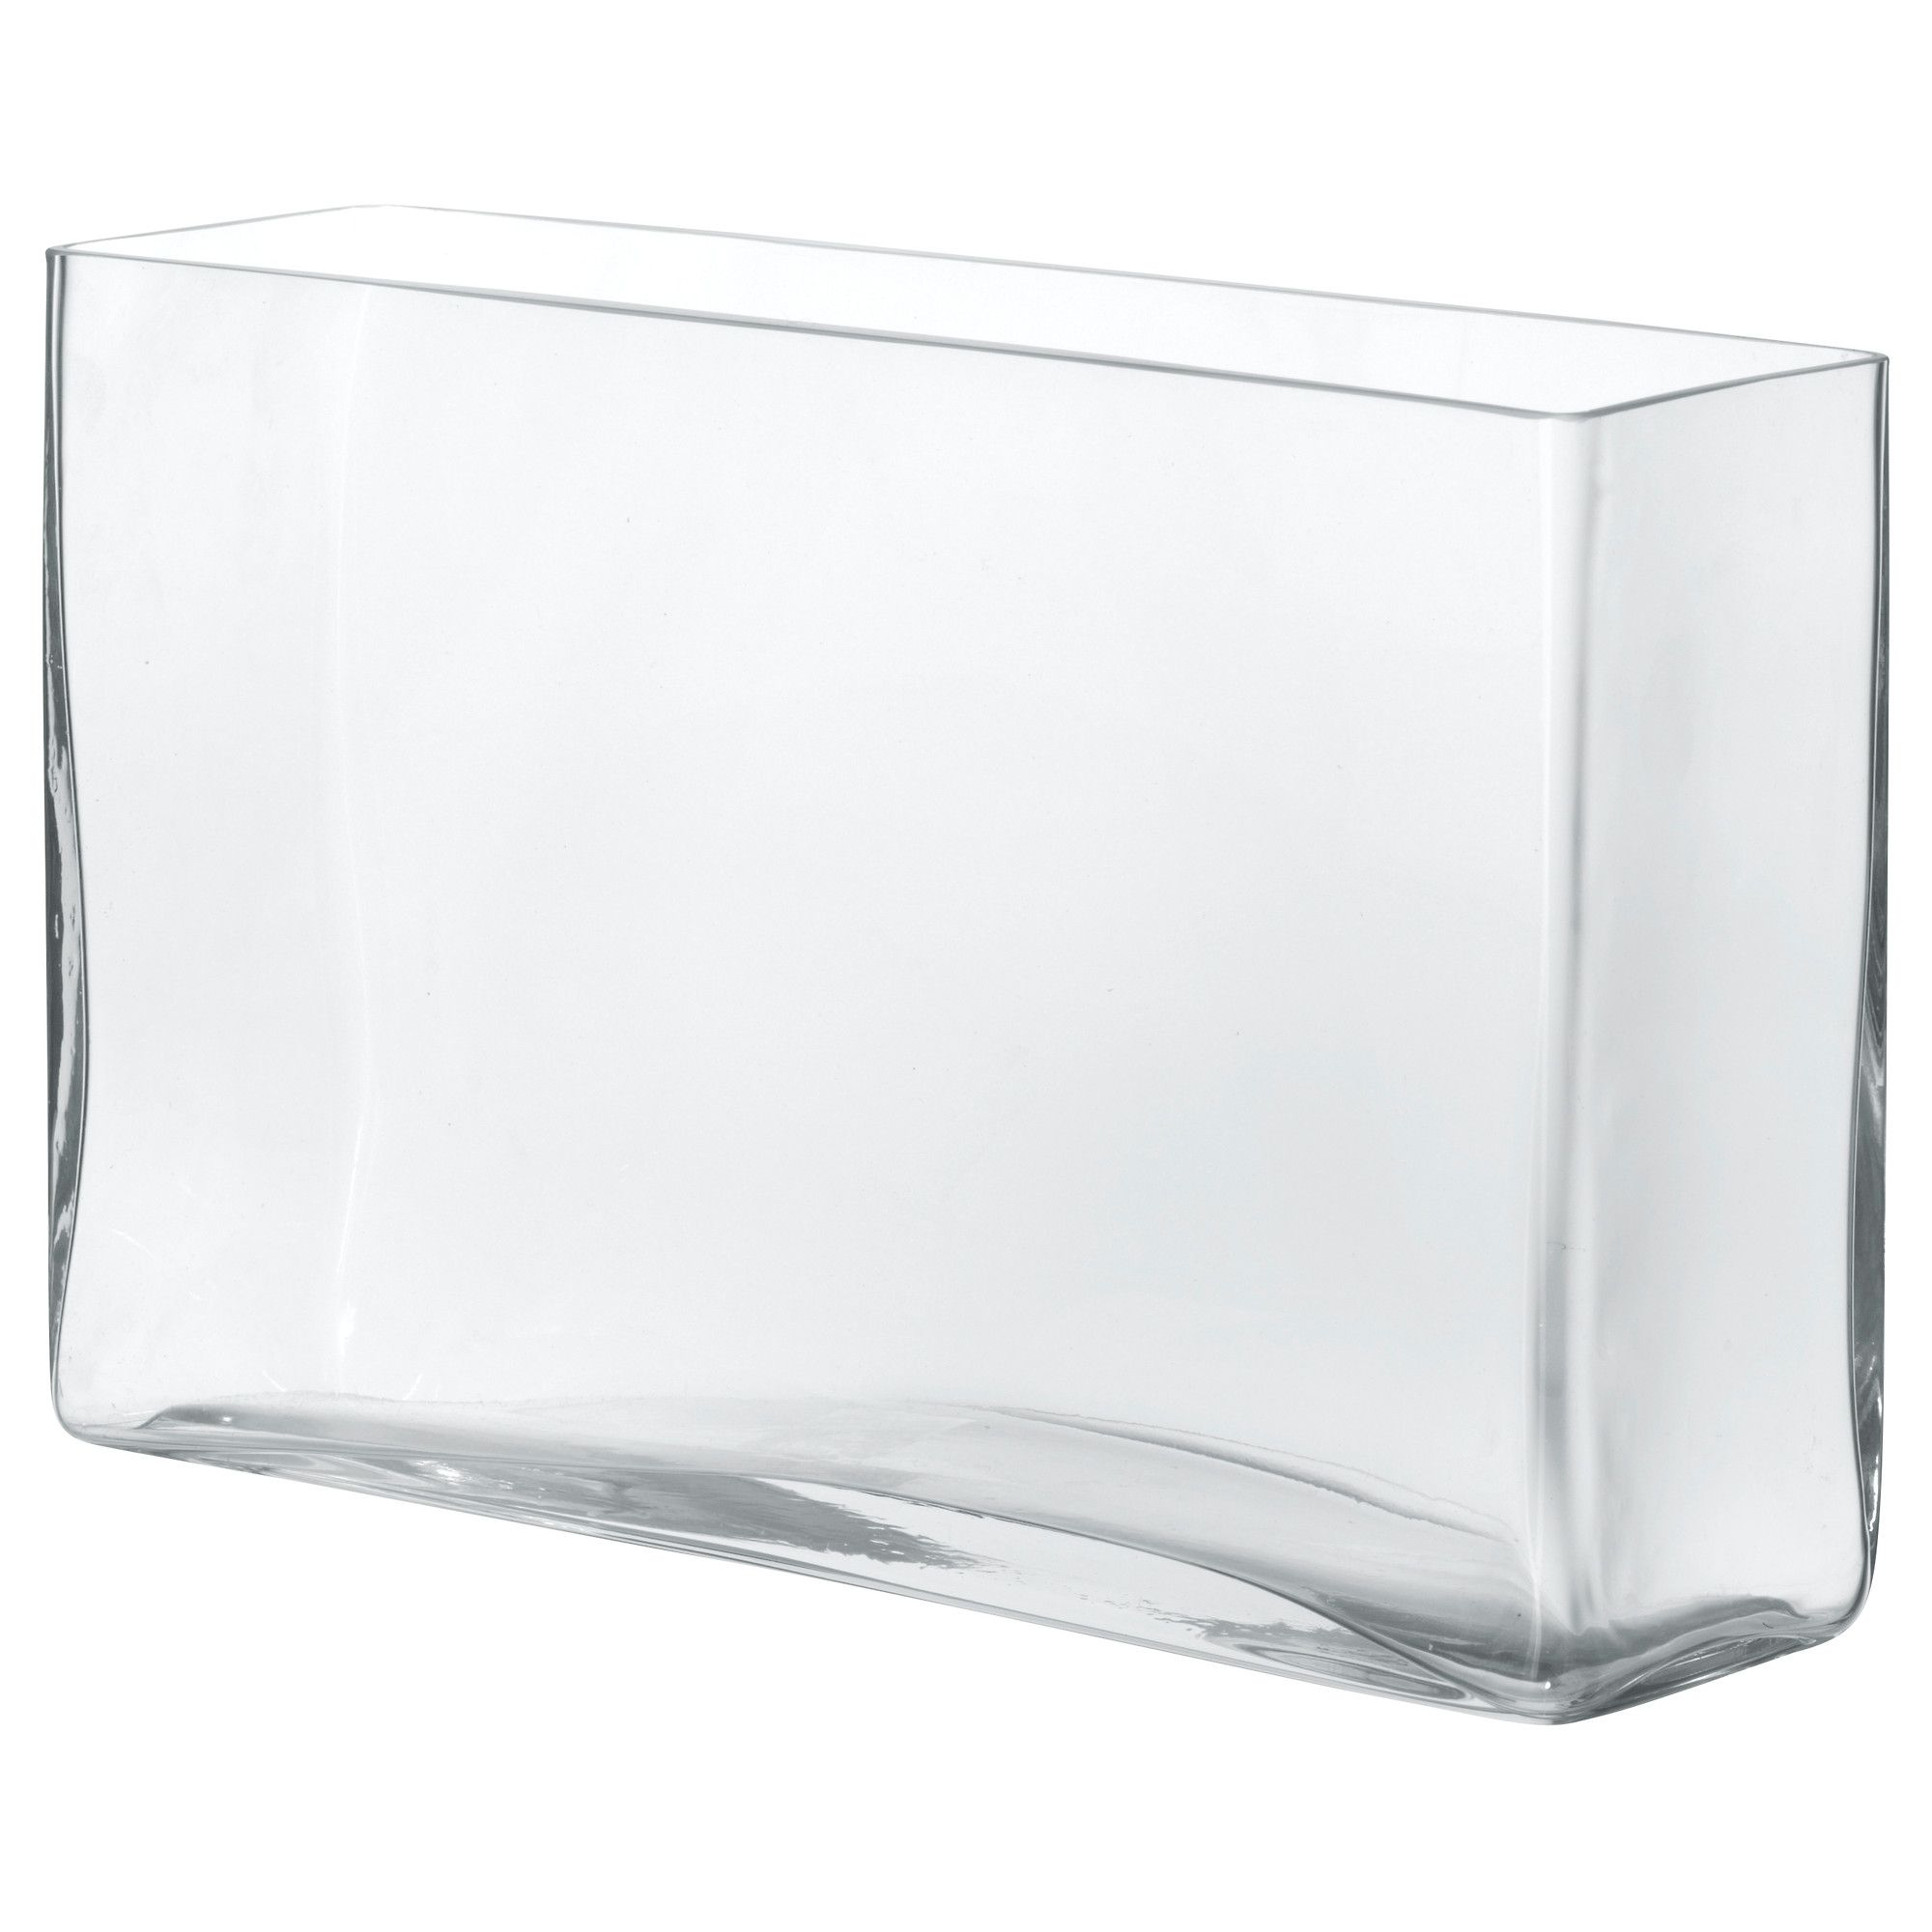 rektangel vase klarglas jetzt bestellen unter. Black Bedroom Furniture Sets. Home Design Ideas